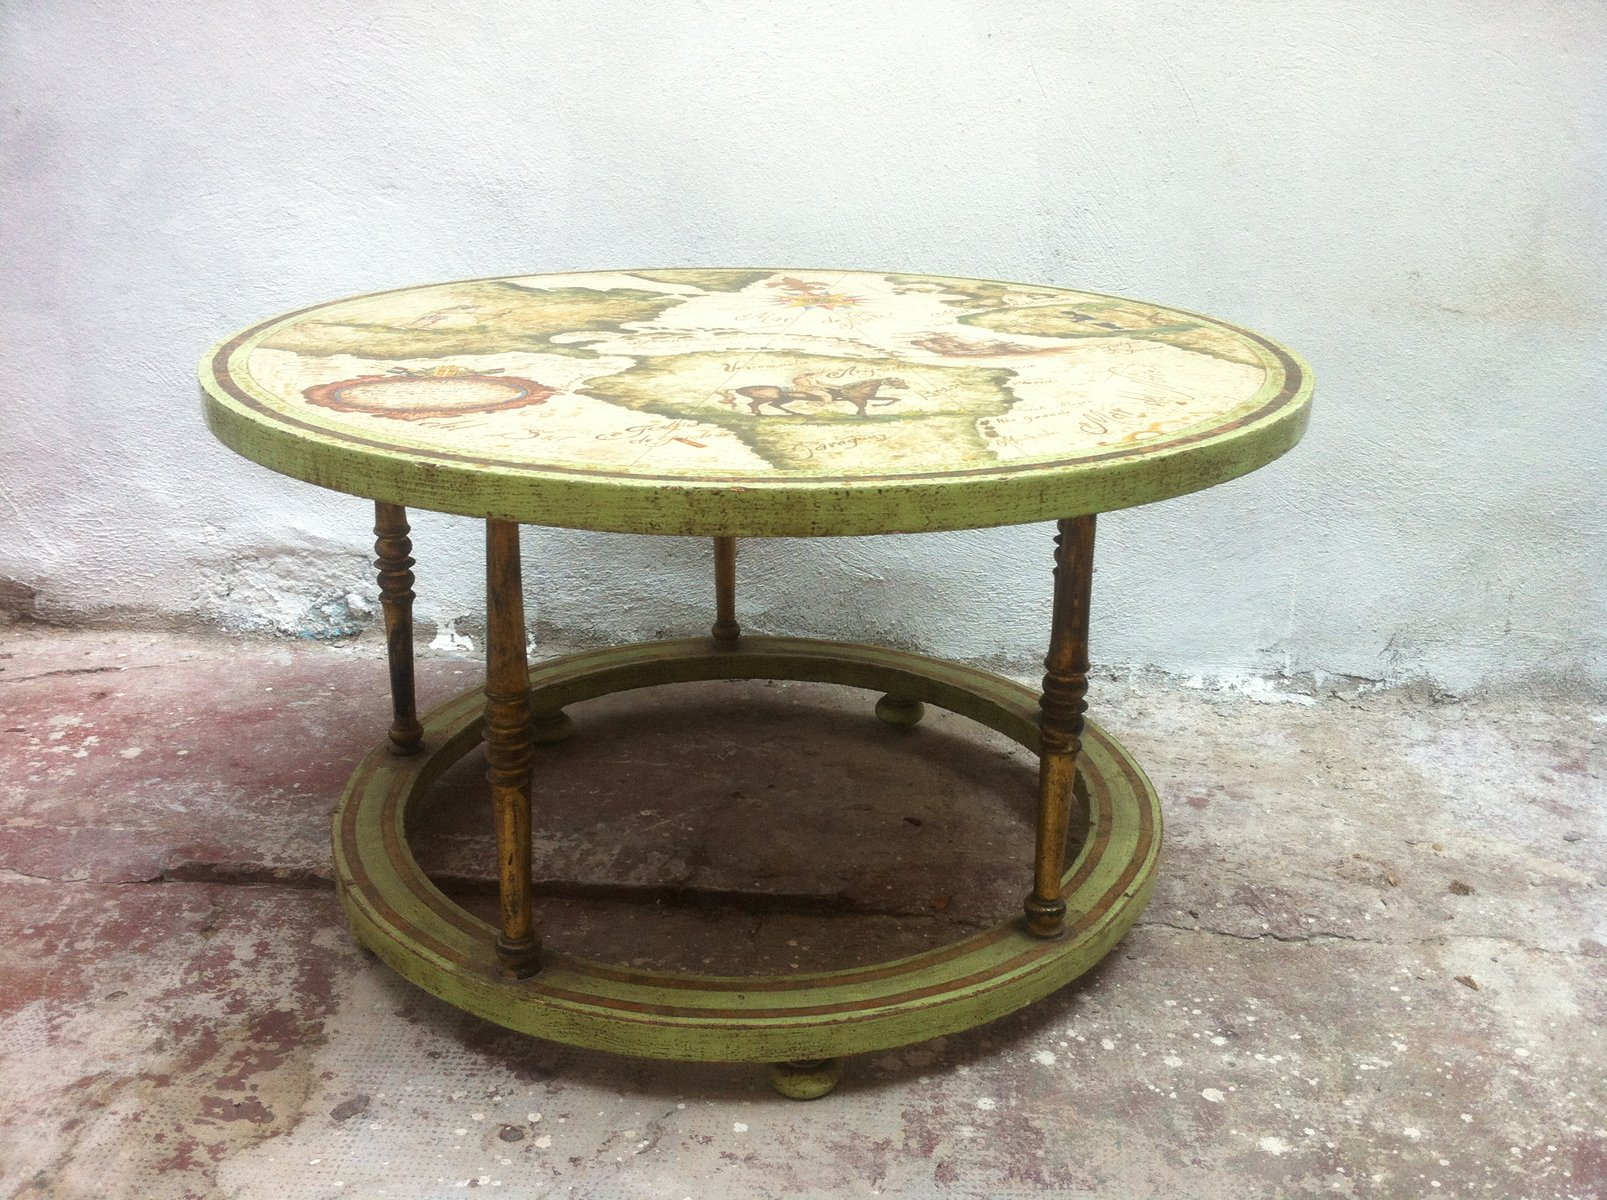 table basse vintage peinte la main en vente sur pamono. Black Bedroom Furniture Sets. Home Design Ideas